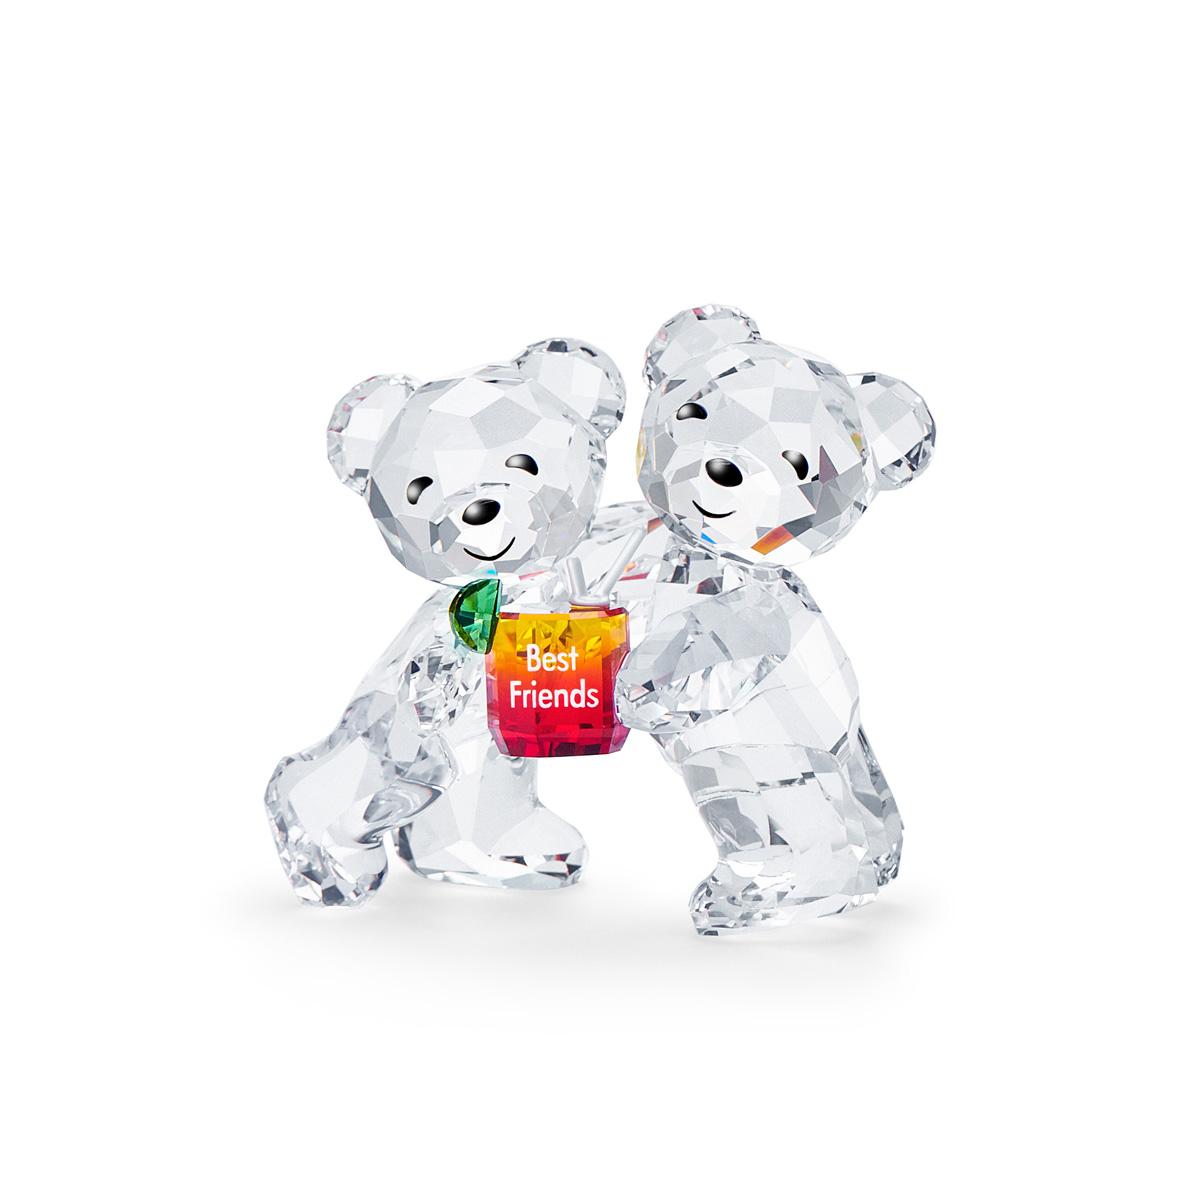 Swarovski Kris Bear Best Friends